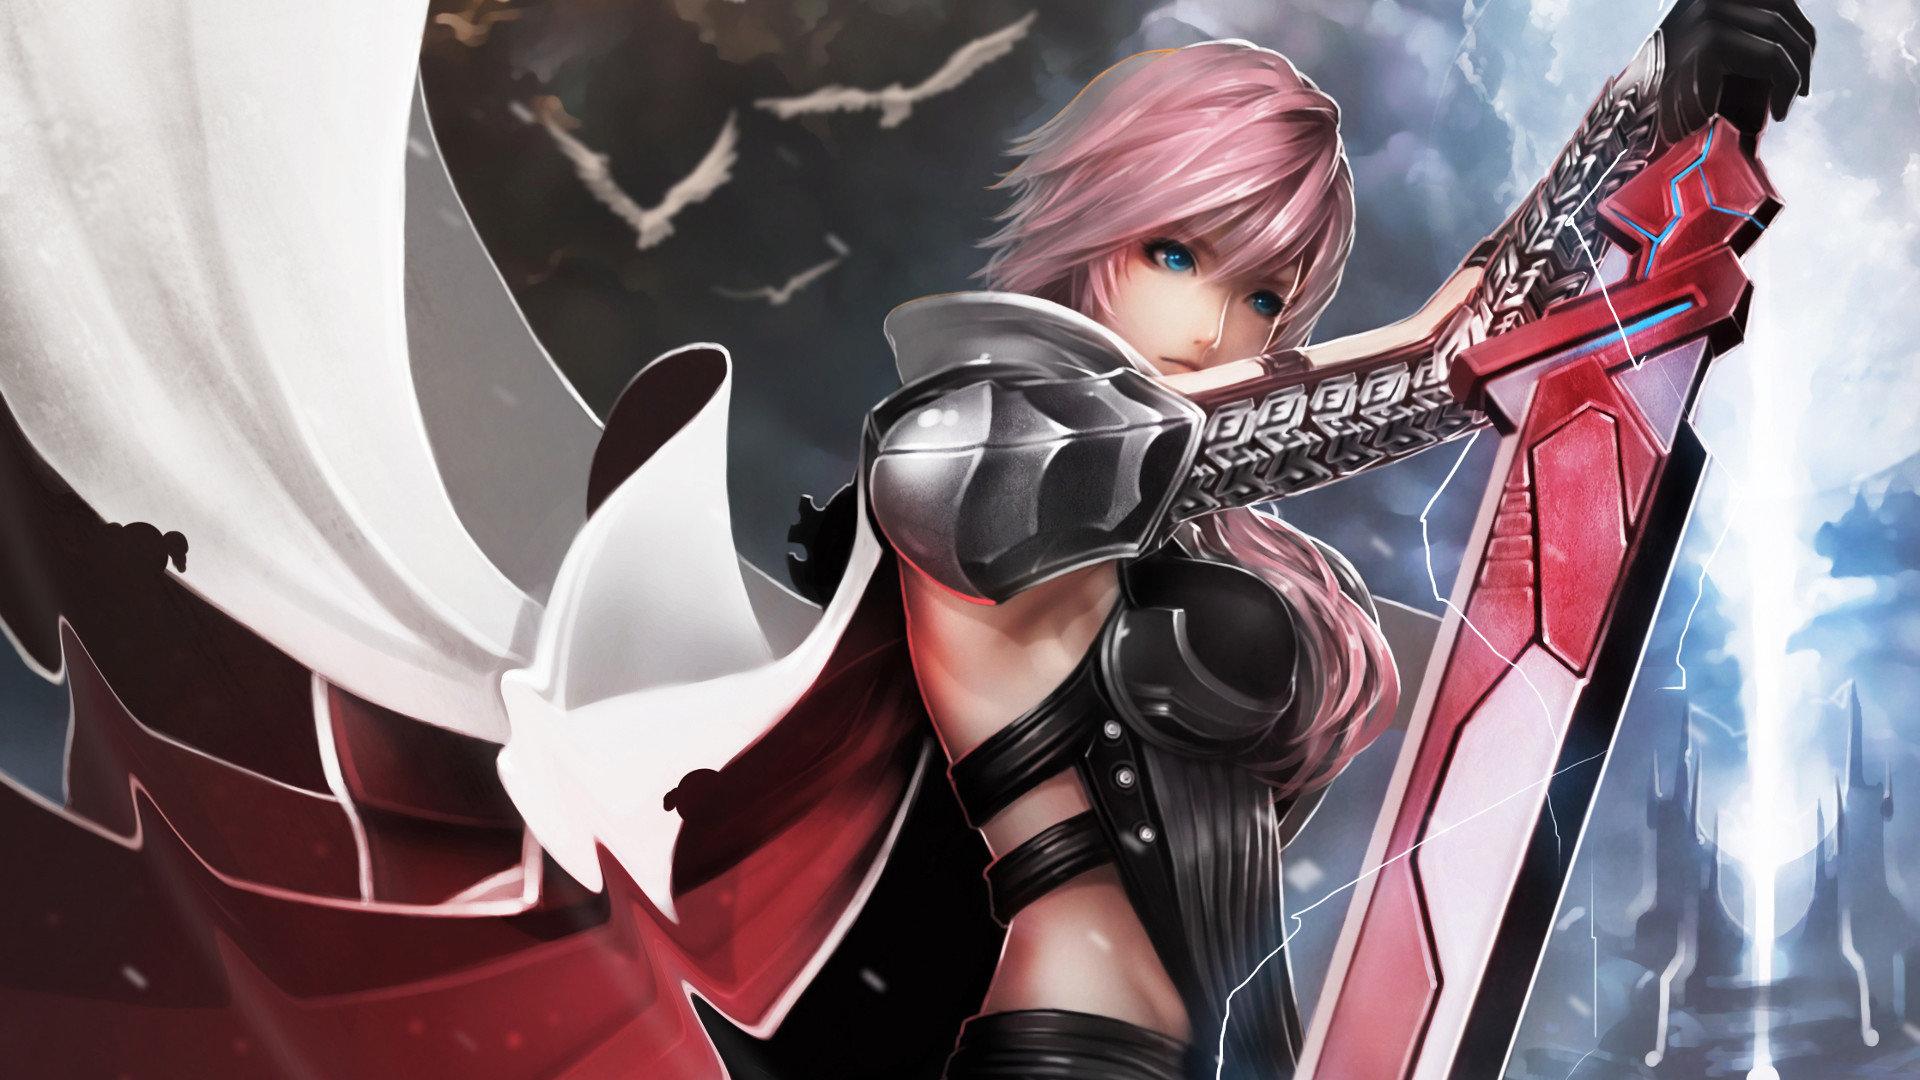 Download Full Hd 1080p Final Fantasy Xiii Ff13 Desktop Wallpaper